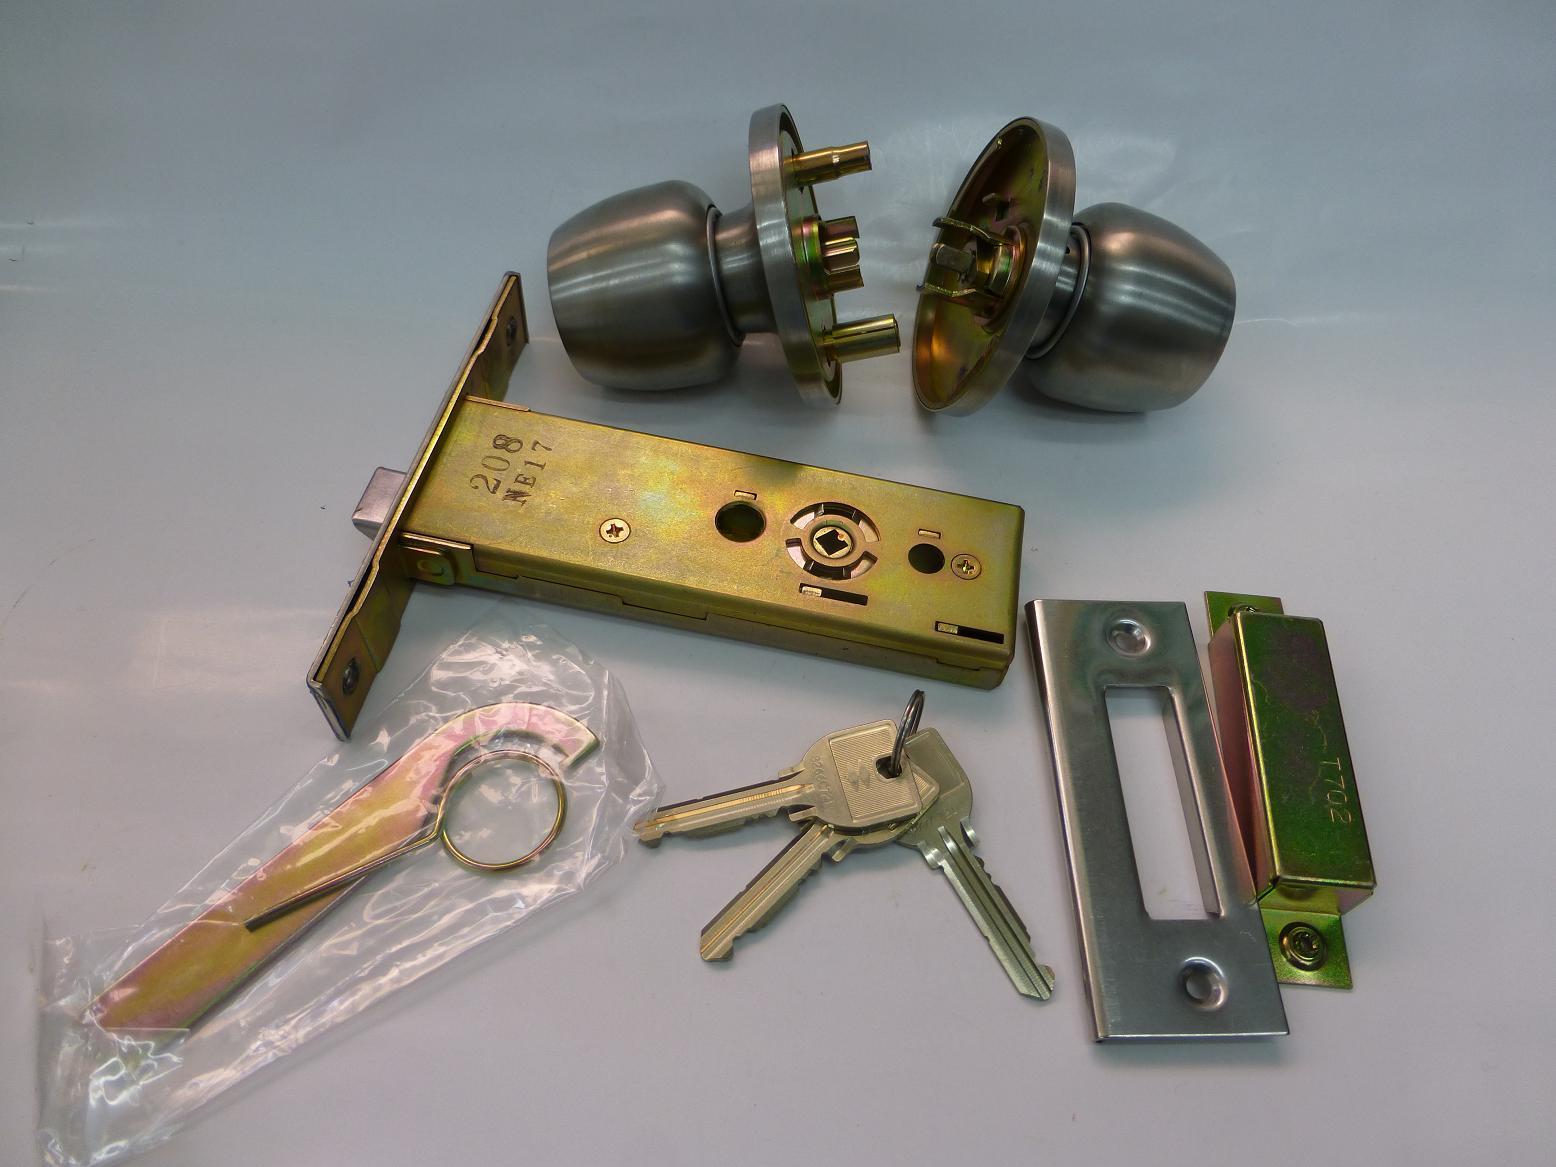 MIWA 握り玉錠 U9 145HMD-4 両面キー